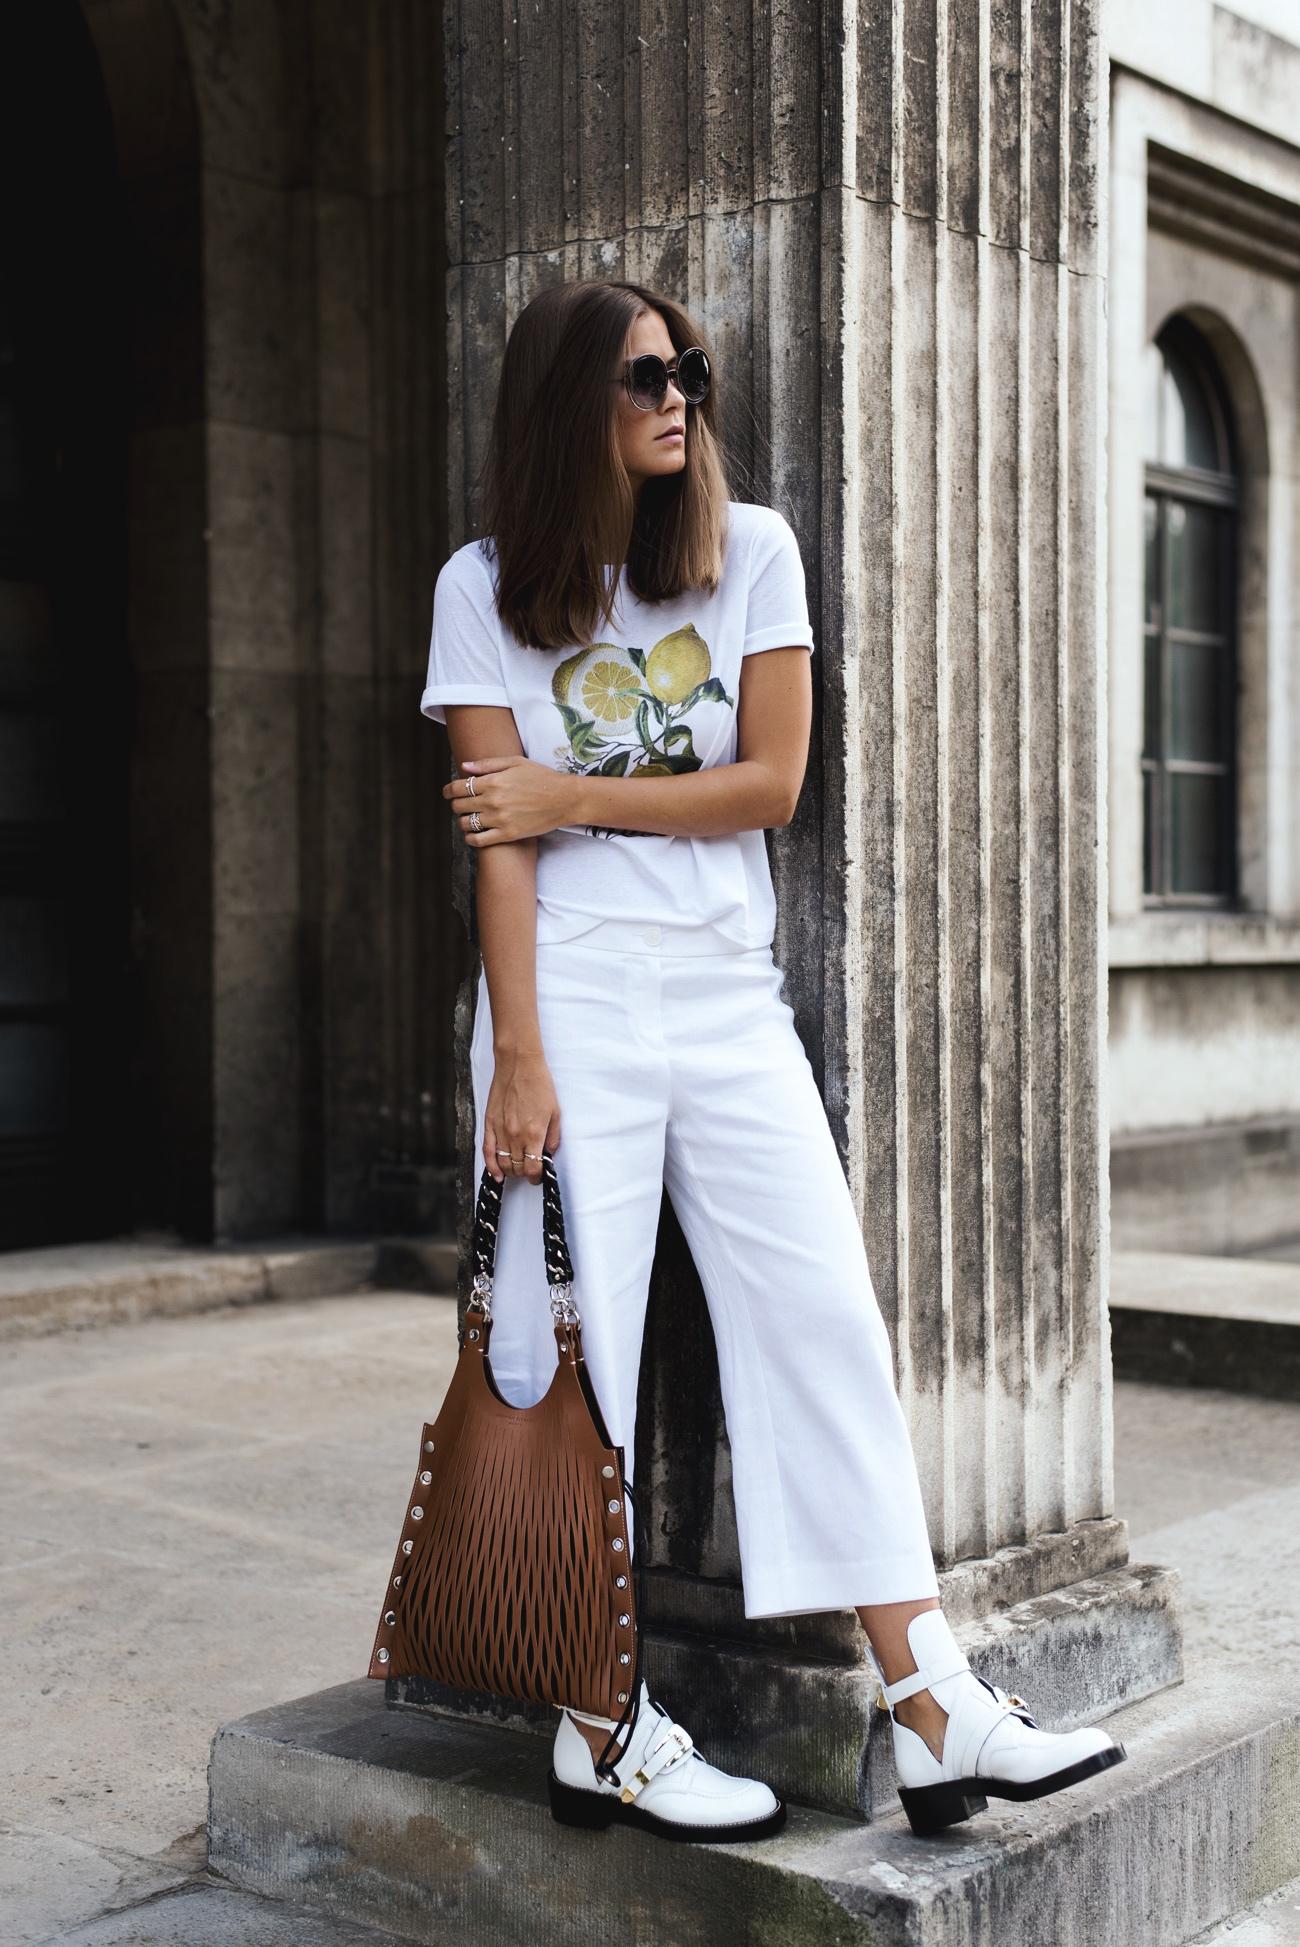 weißes-sommer-outfit-culotte-und-t-shirt-fashiioncarpet